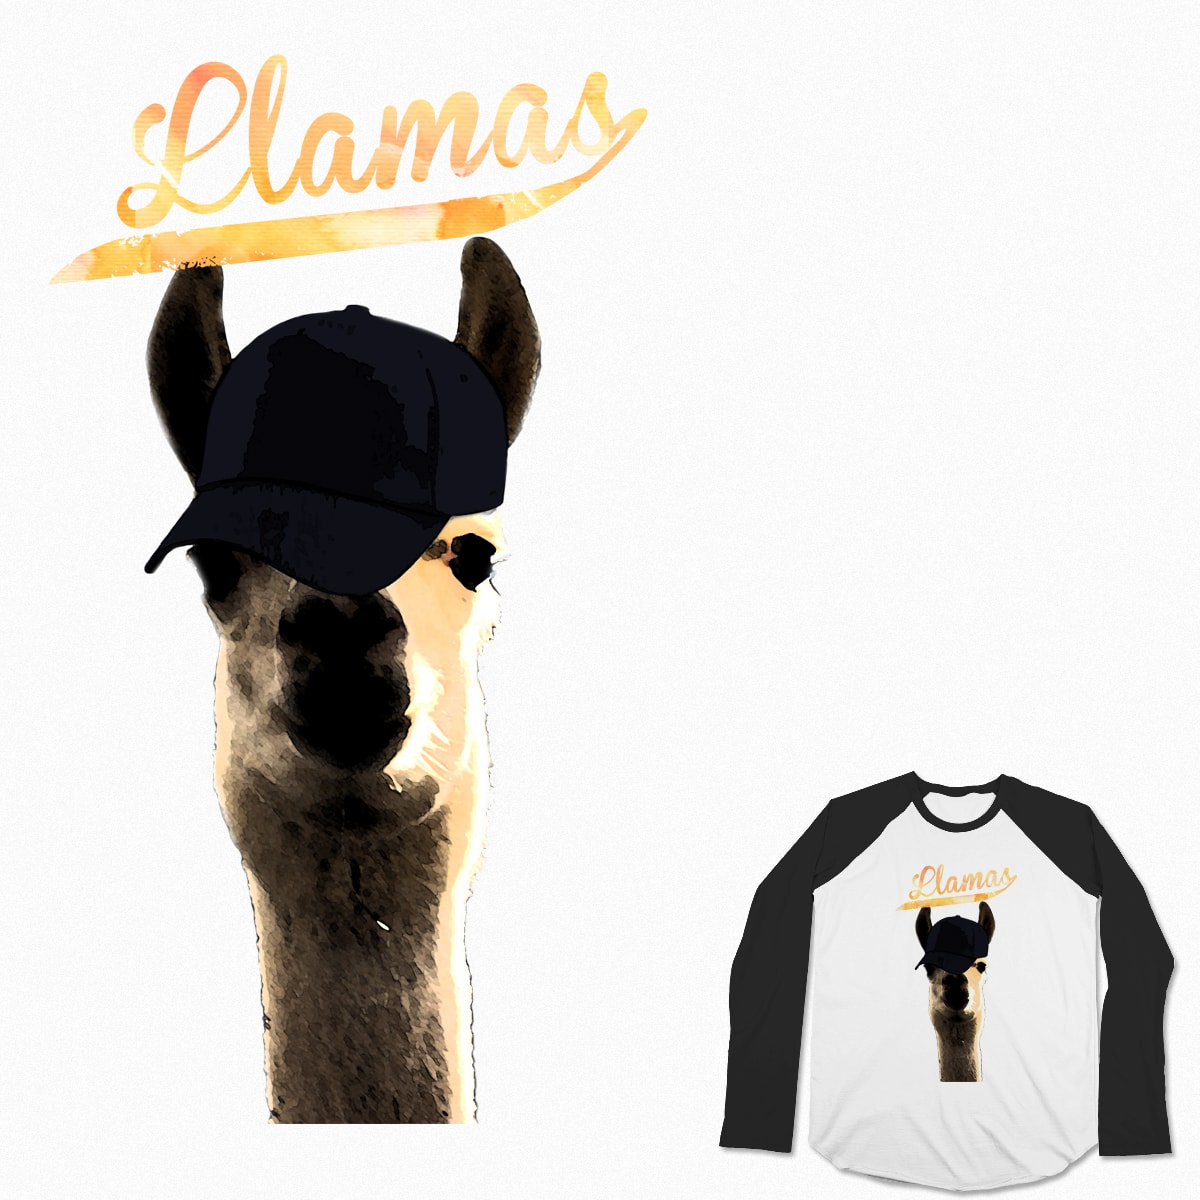 Llamas Team by olgasrandomness on Threadless